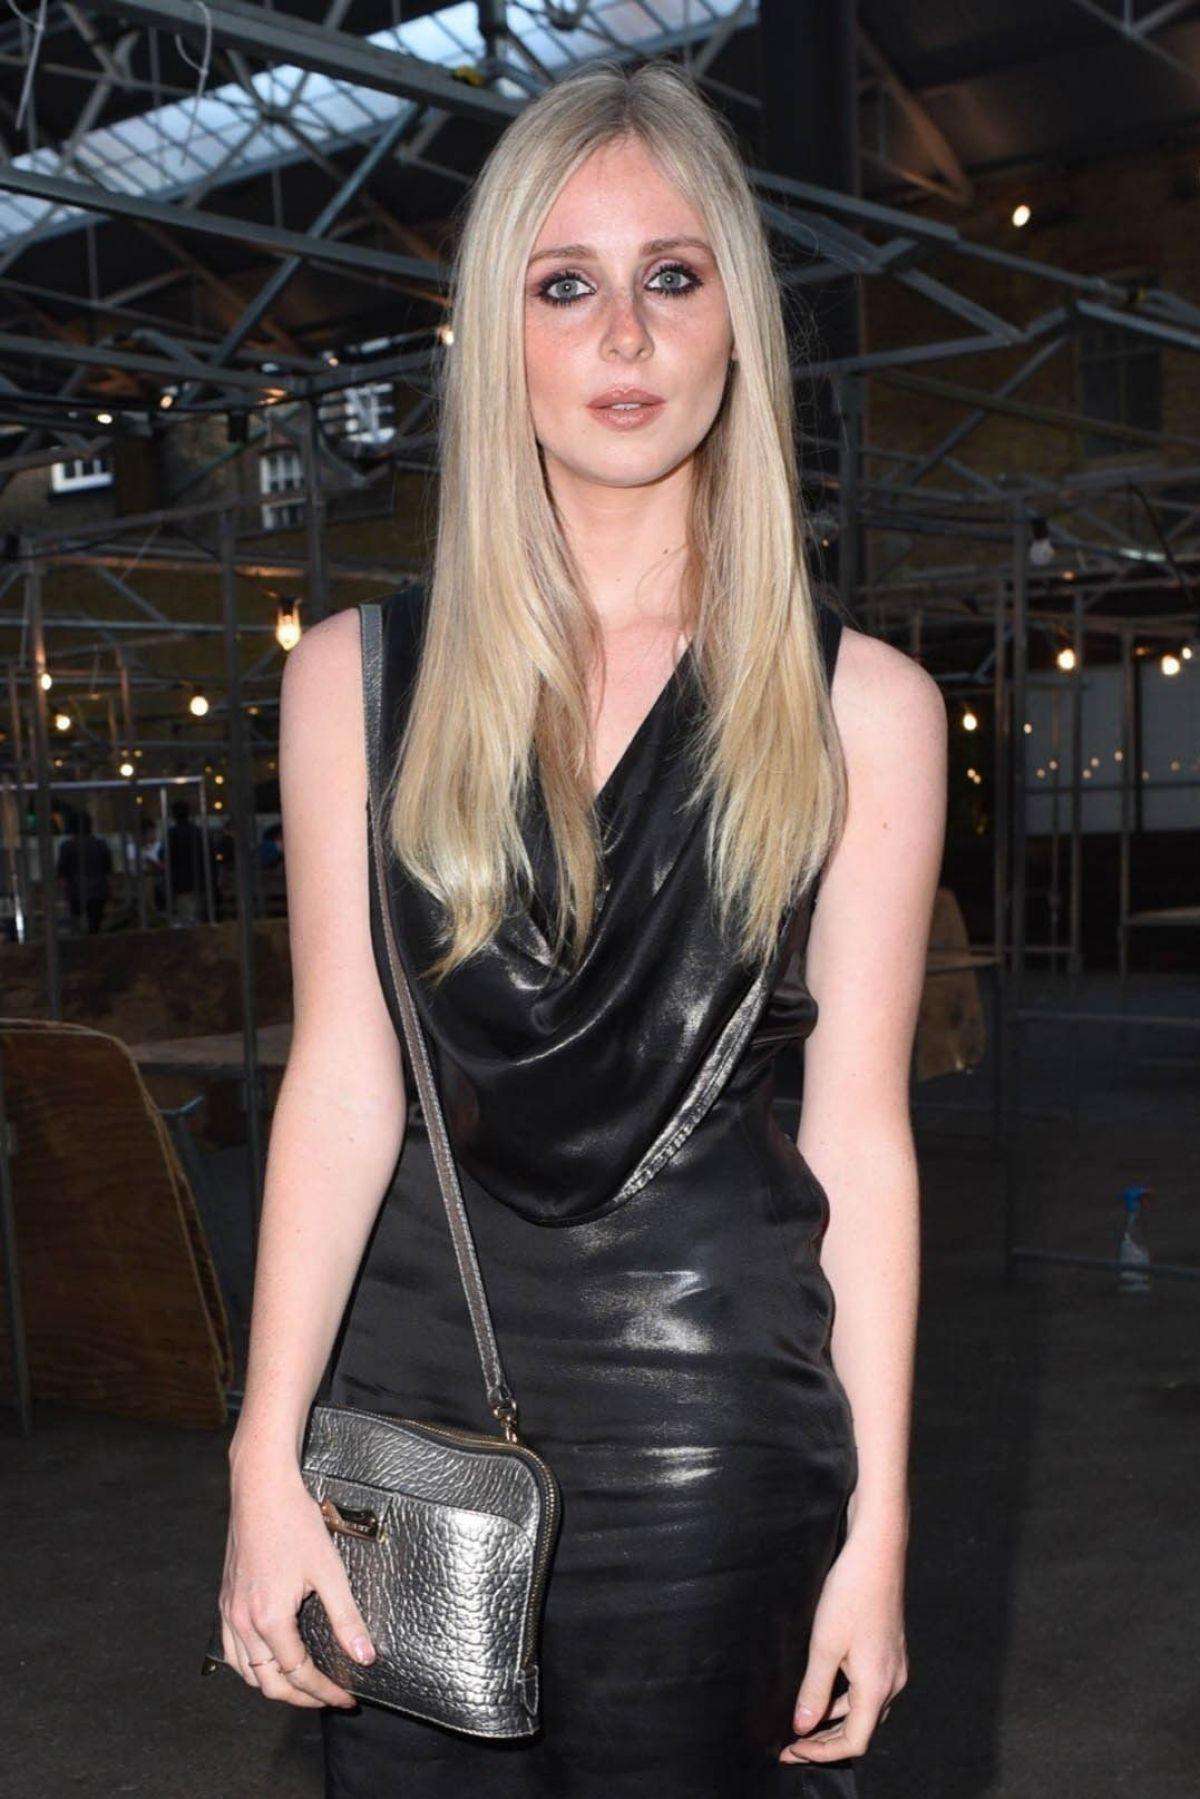 DIANA VICKERS at Bespoke Fashion Show